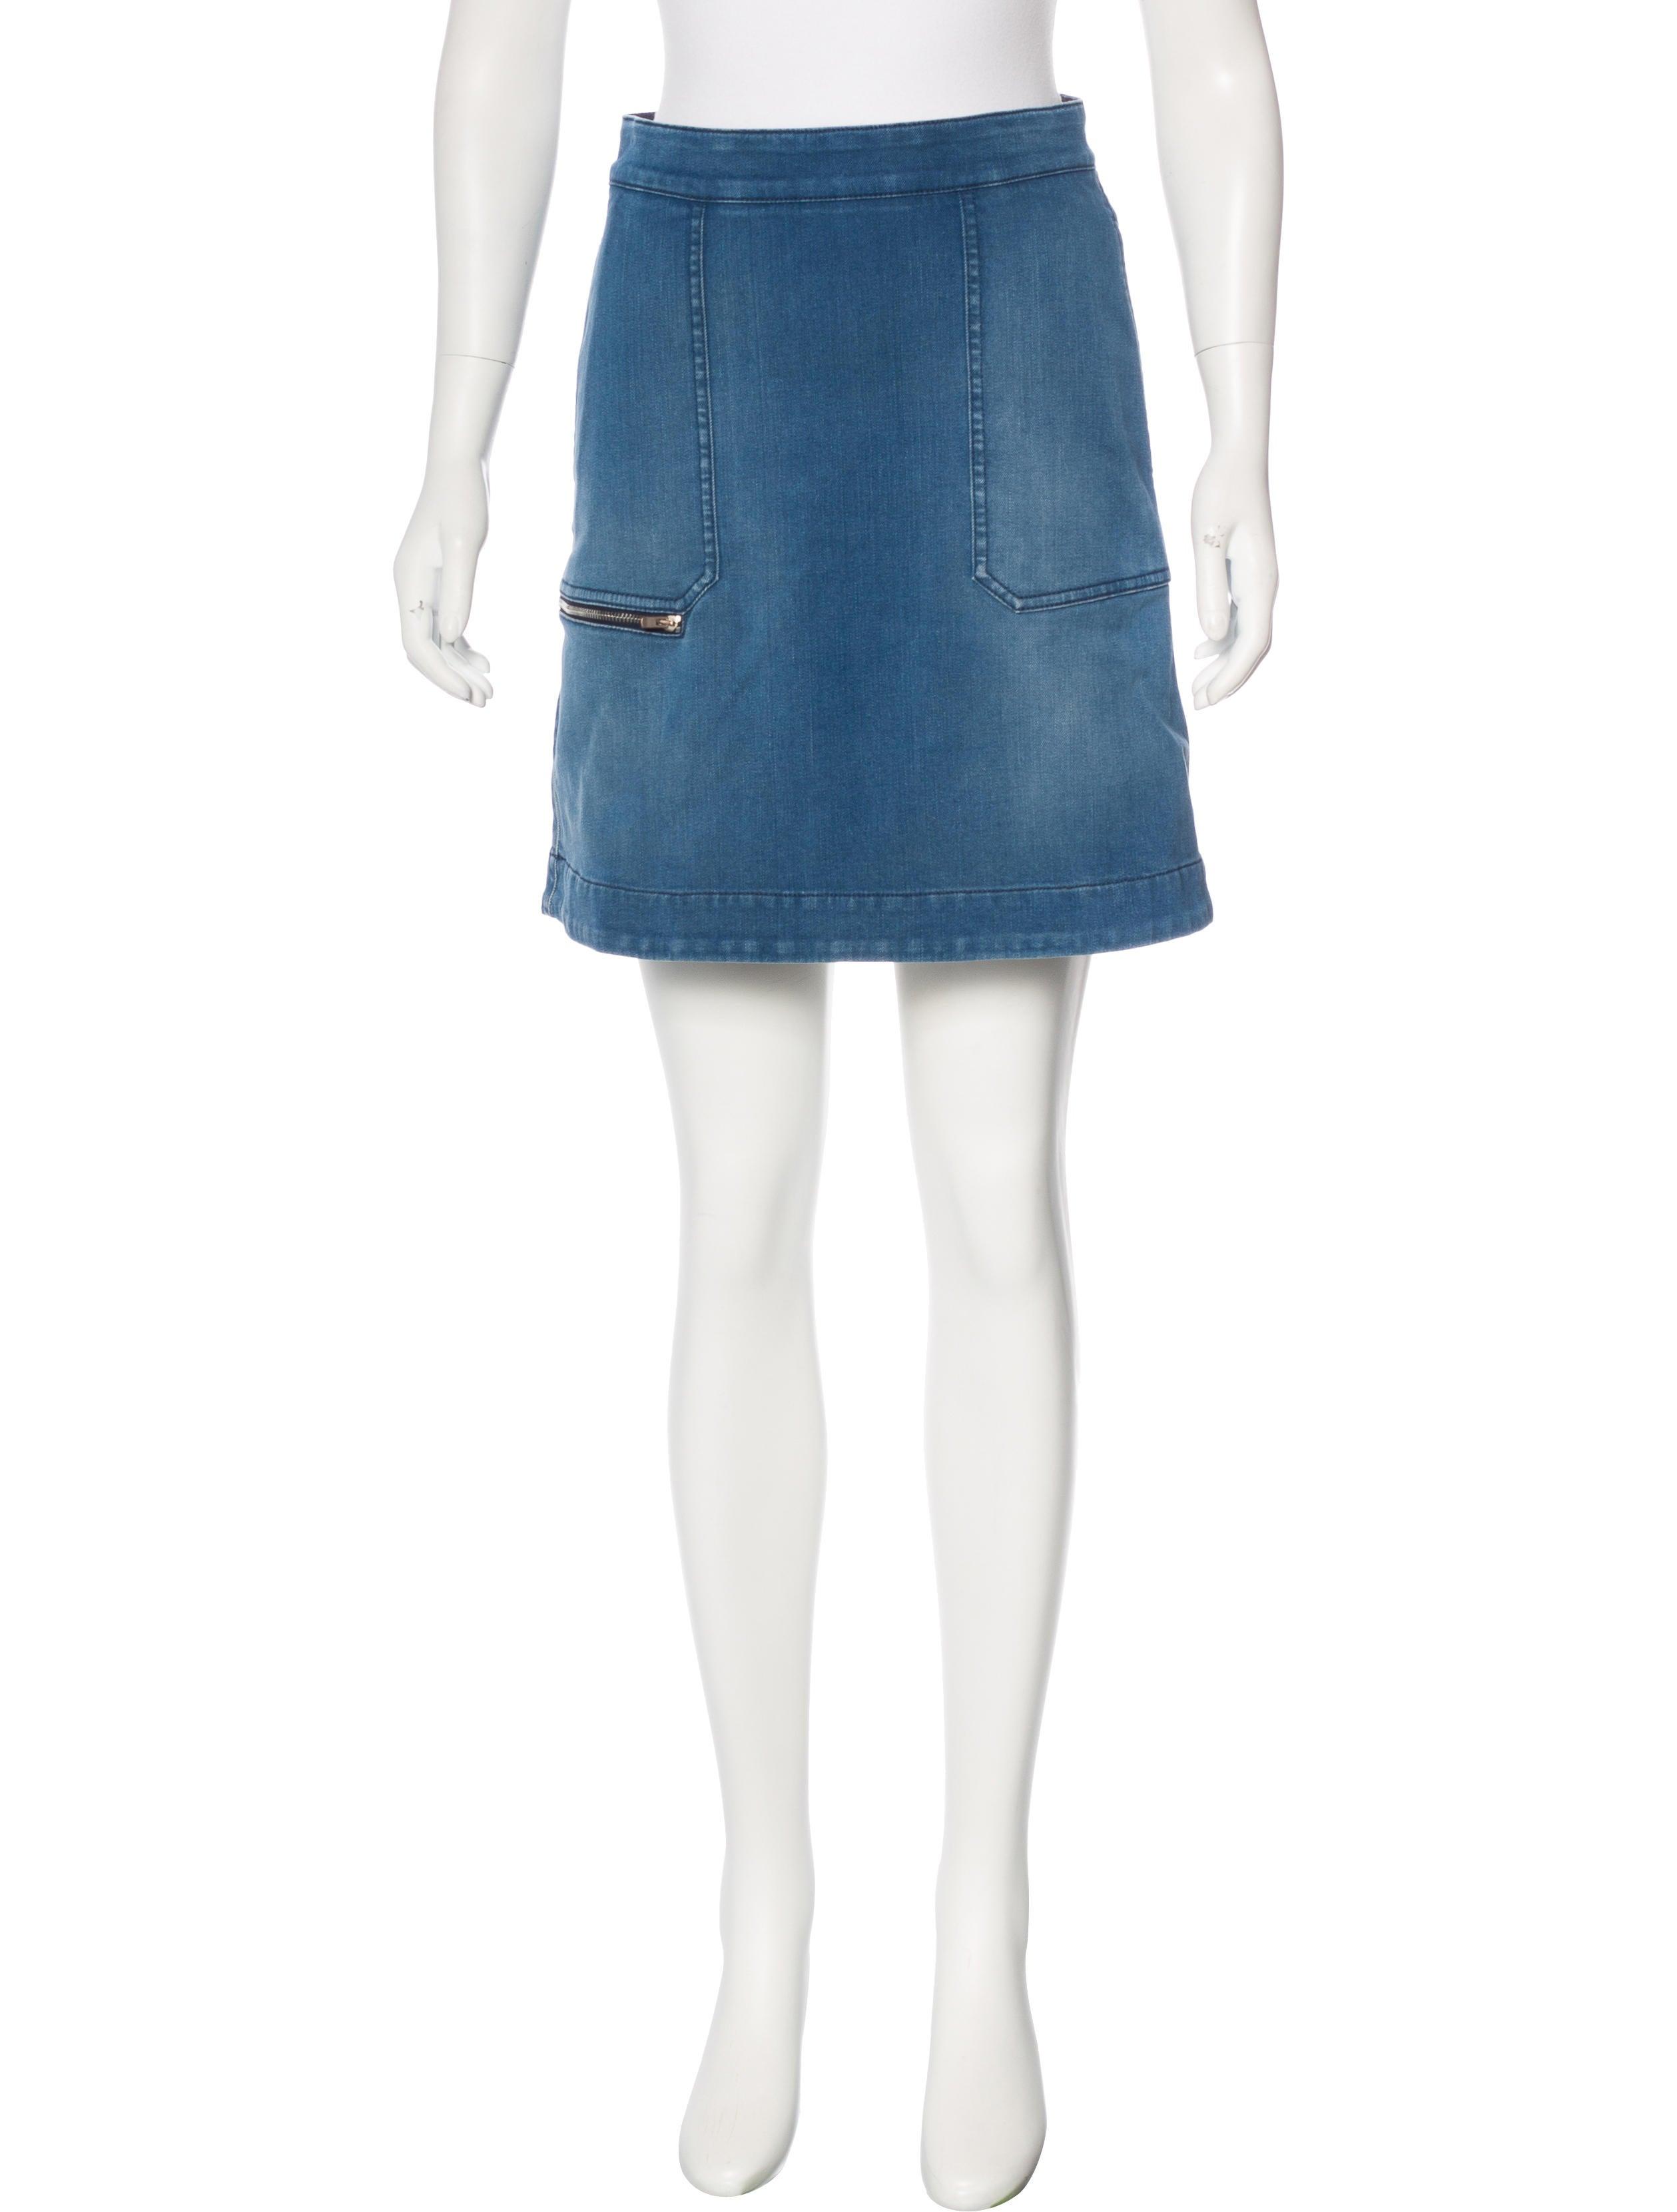 stella mccartney denim mini skirt clothing stl53735